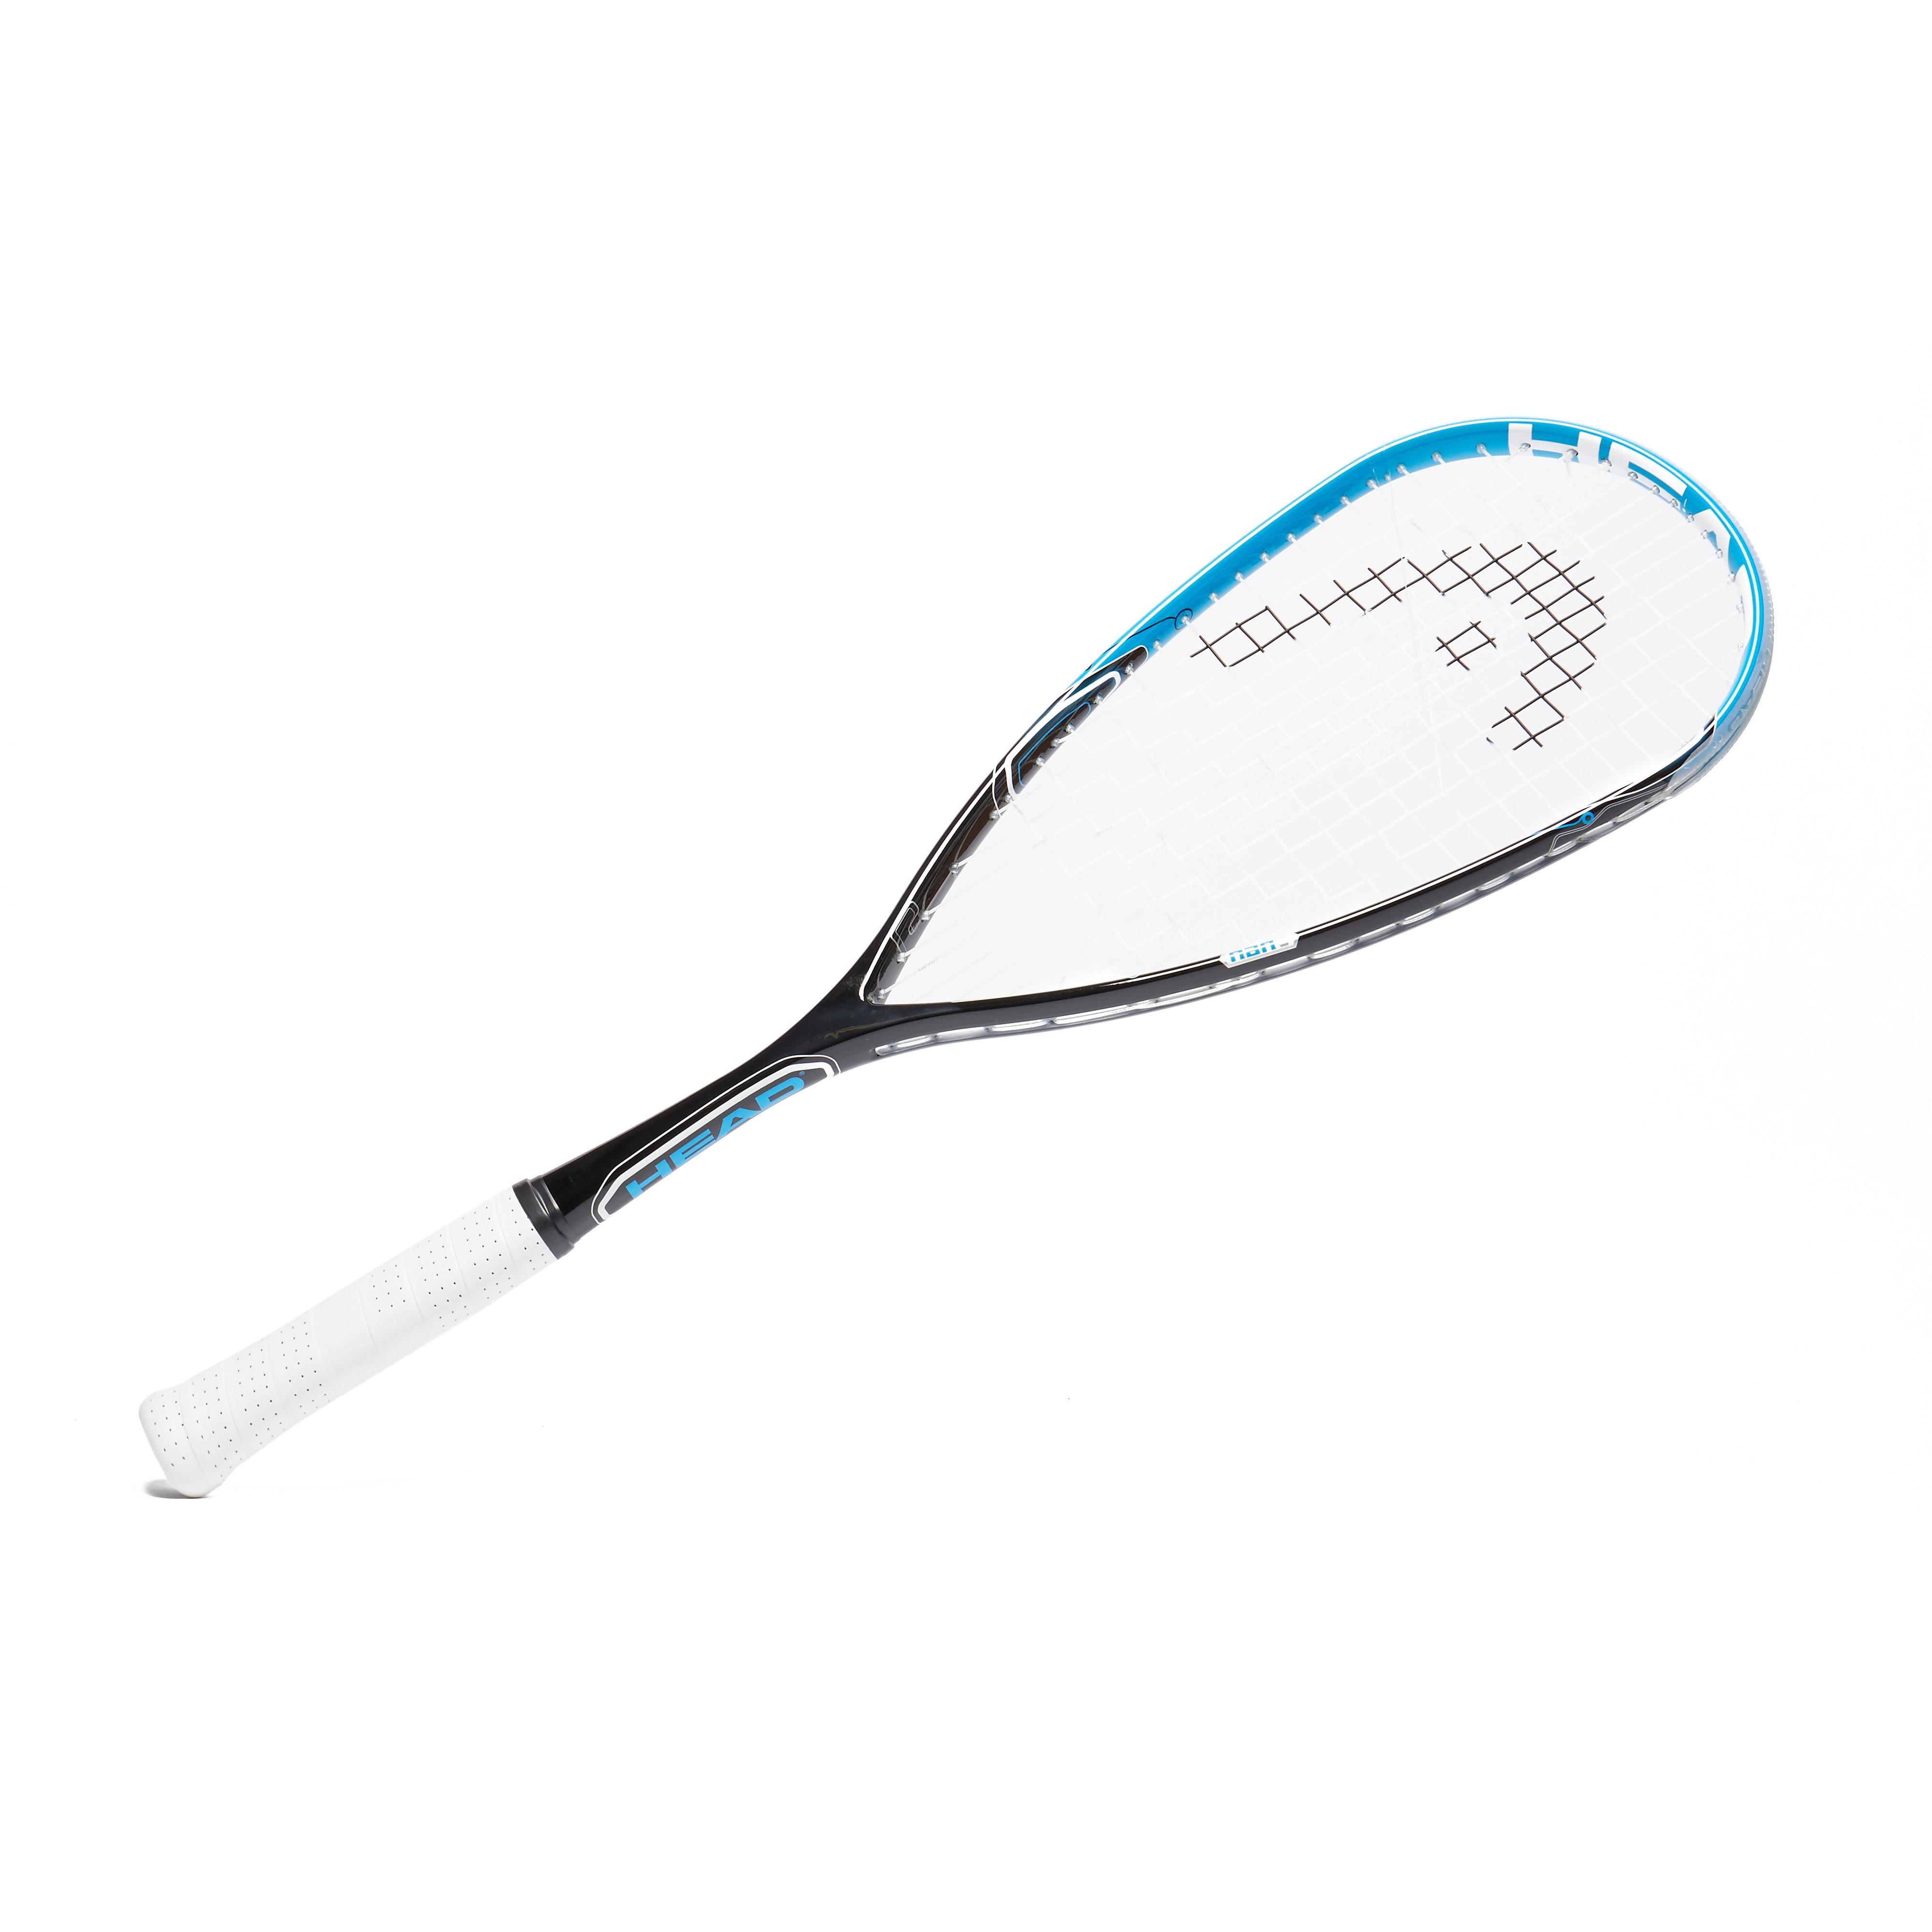 Head Nano Titanium Speed Squash Racket